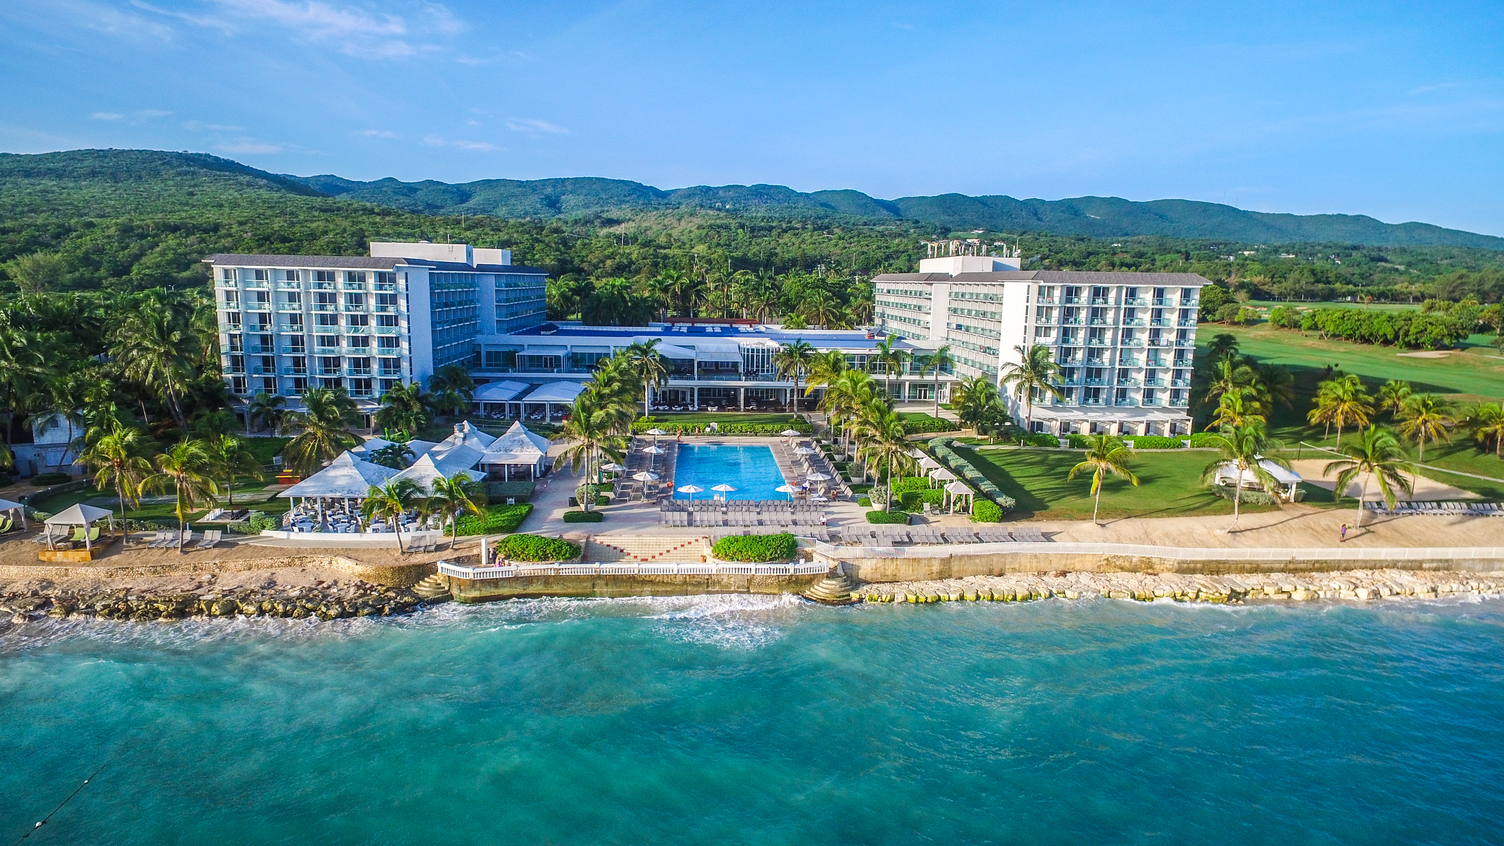 Hilton-Resort-&-Spa-Rose-Hall-Aerial-3.jpg